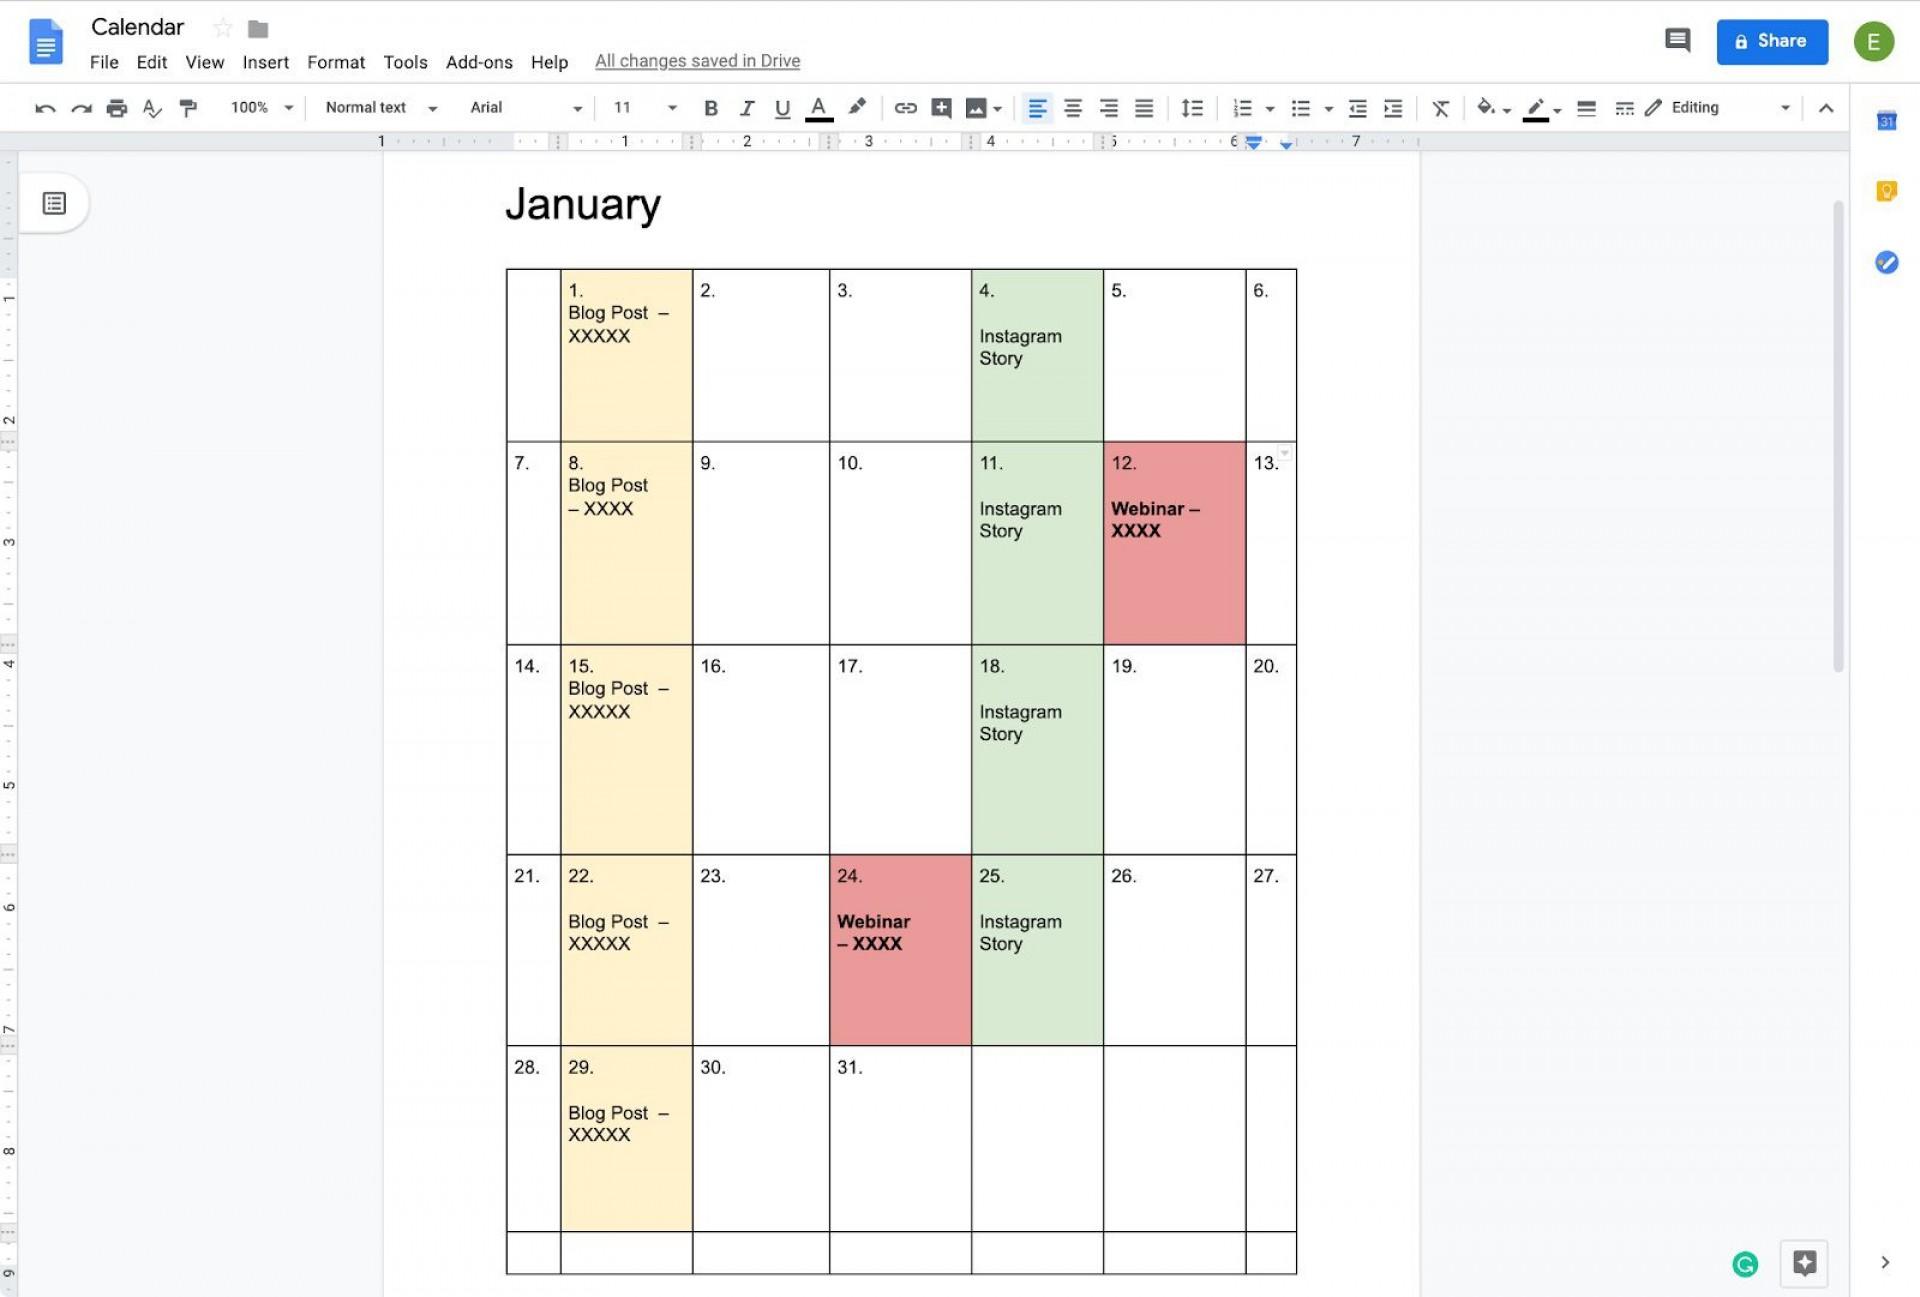 001 Imposing Calendar Template Google Doc High Definition  Docs Editable Two Week 2019-201920